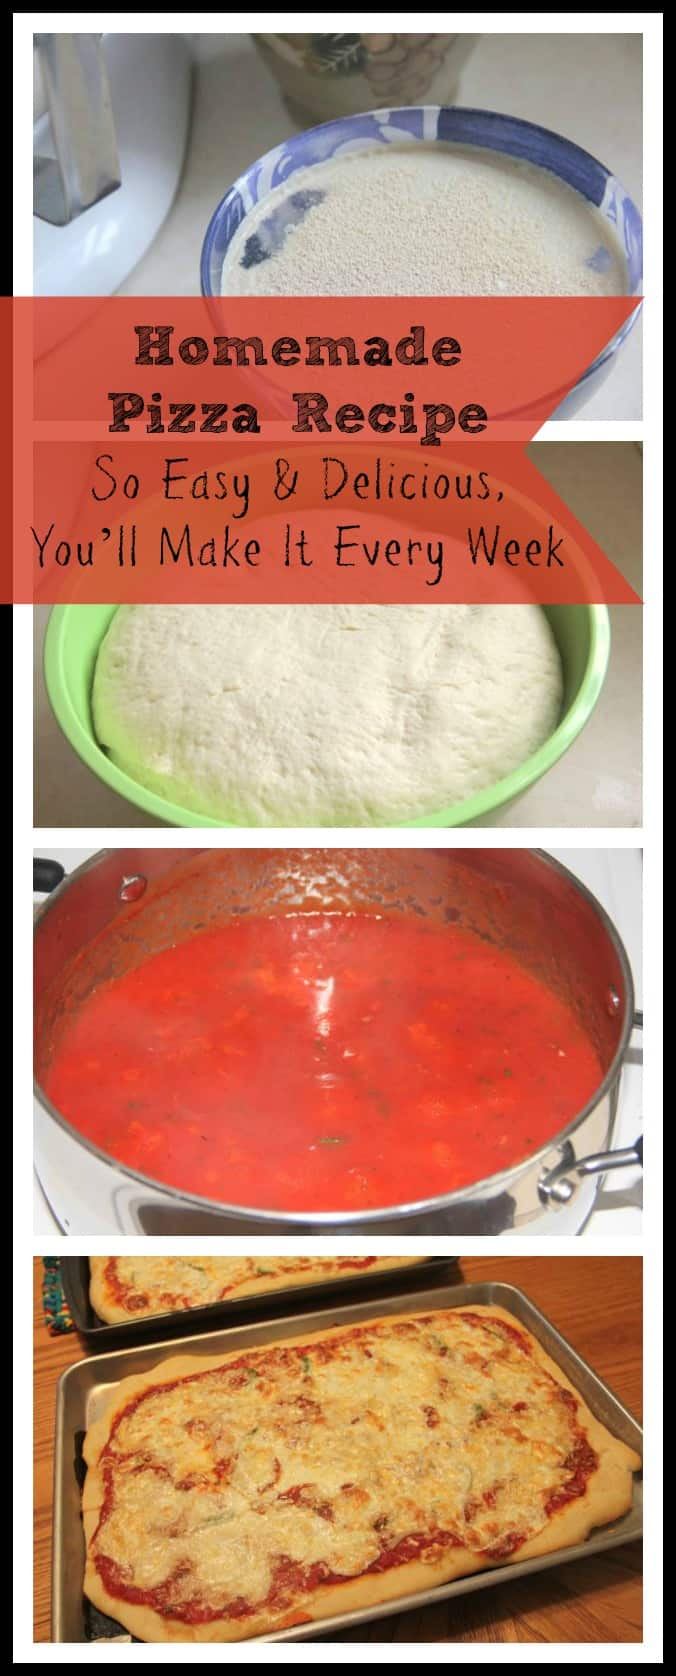 Homemade Pizza Recipe Image